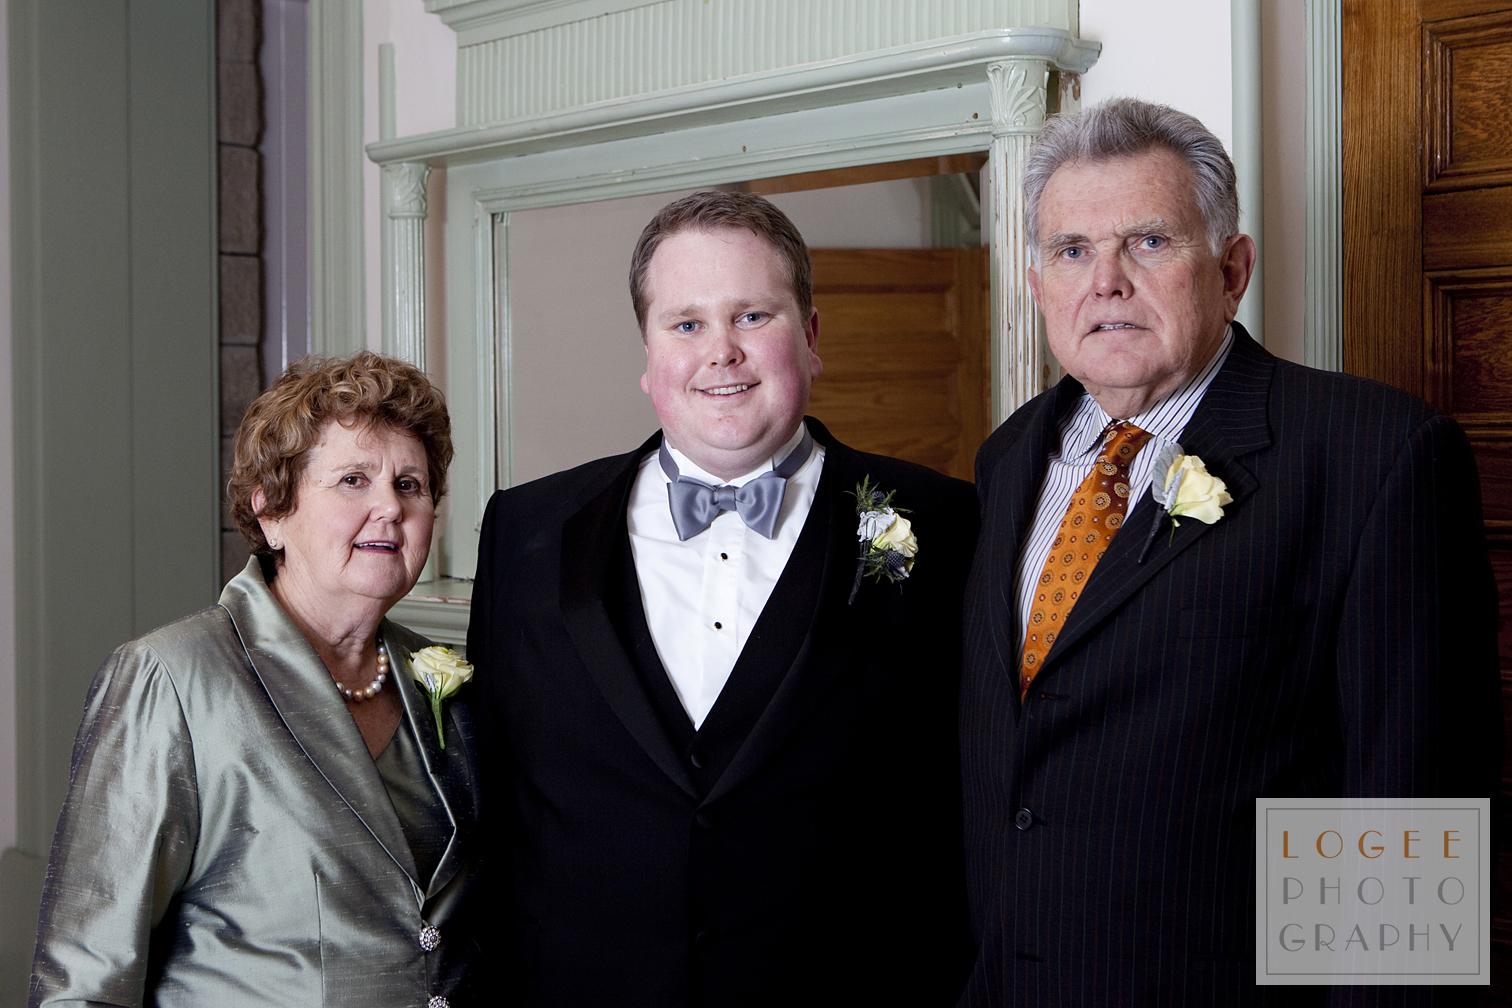 McIntosh-Burns Wedding - 7006Aw